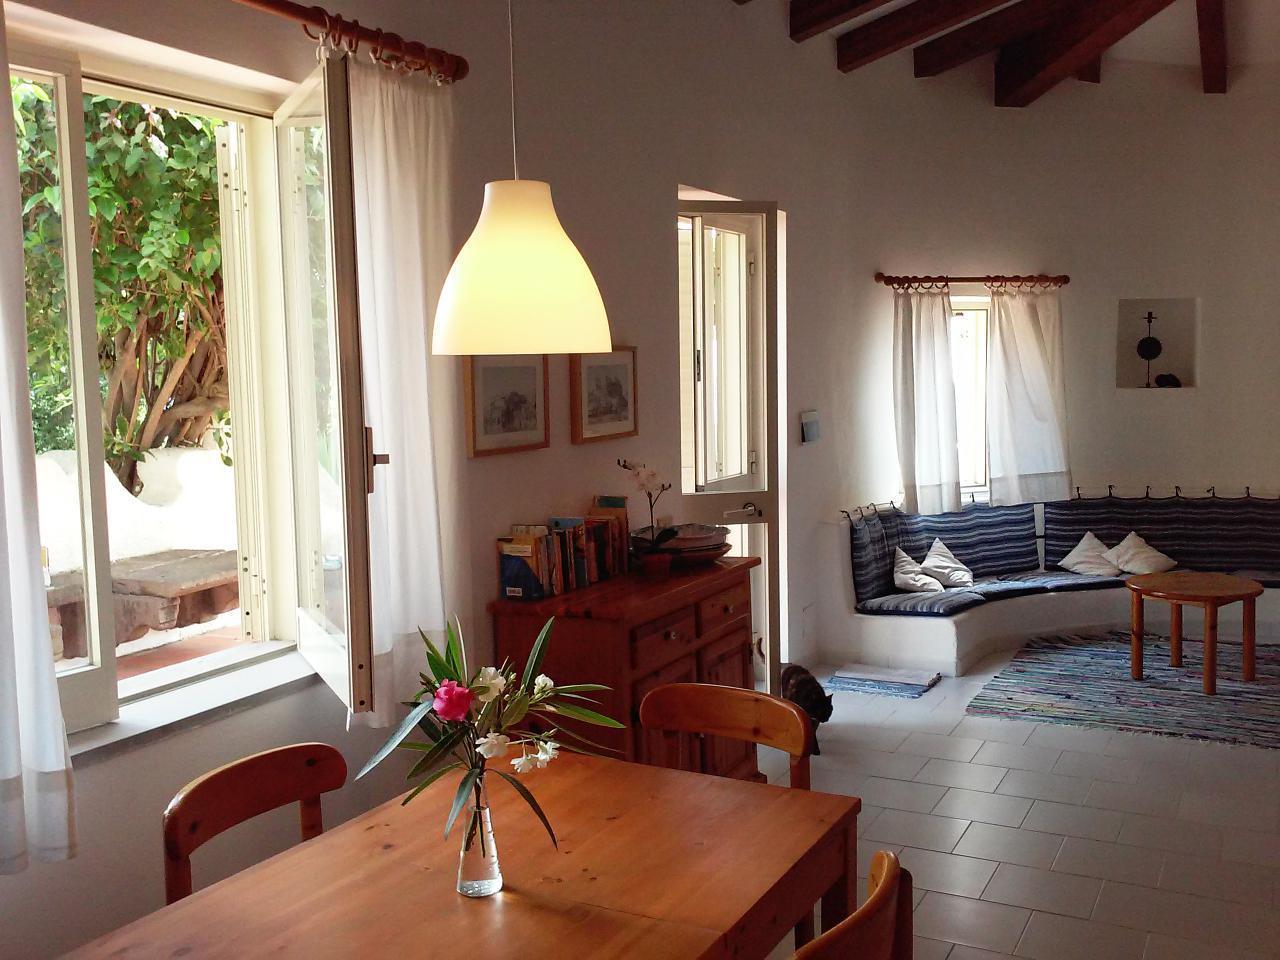 Maison de vacances Ferienhaushälfte Solandra auf sizilianischer Insel mit atemberaubenden Meeres-Rundblick (2038046), Lipari, Lipari, Sicile, Italie, image 13